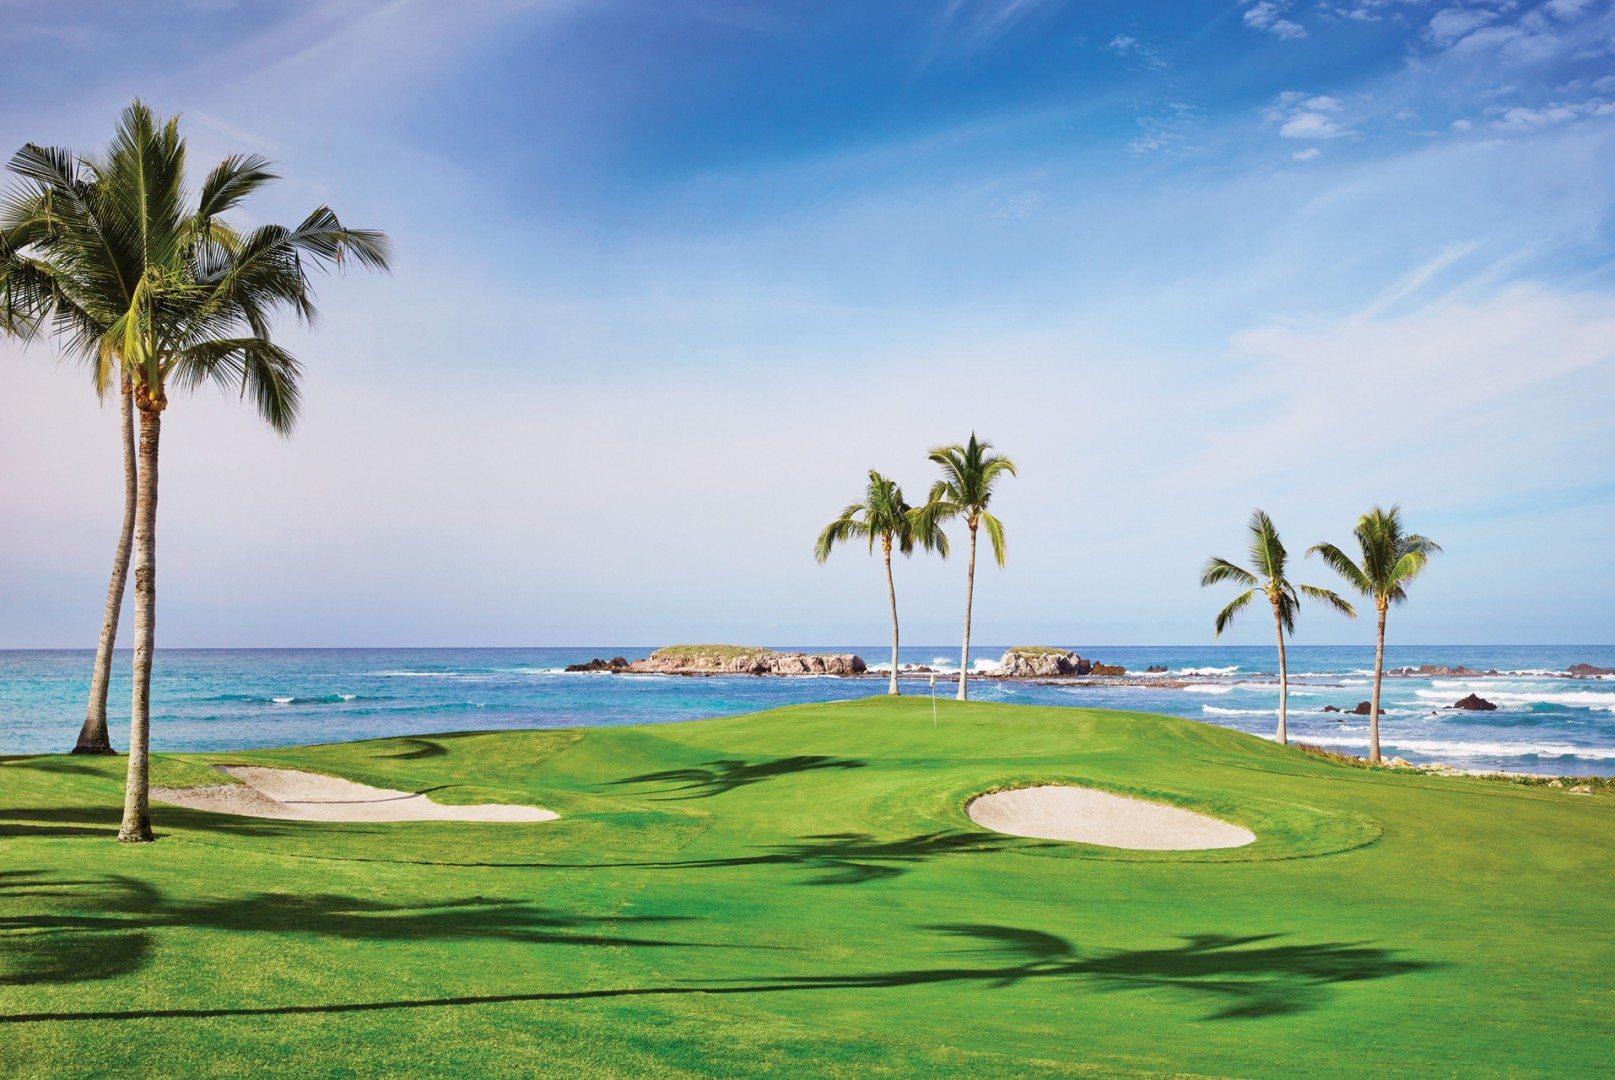 Pacifico Golf Course, Punta Mita, Four Seasons